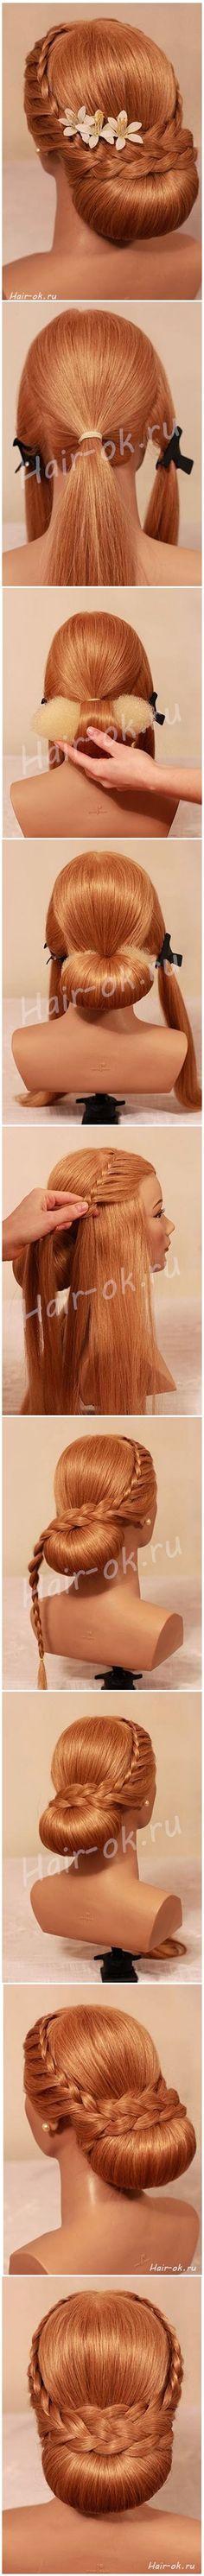 DIY Elegant Evening Braid Hairstyle | WonderfulDIY.com